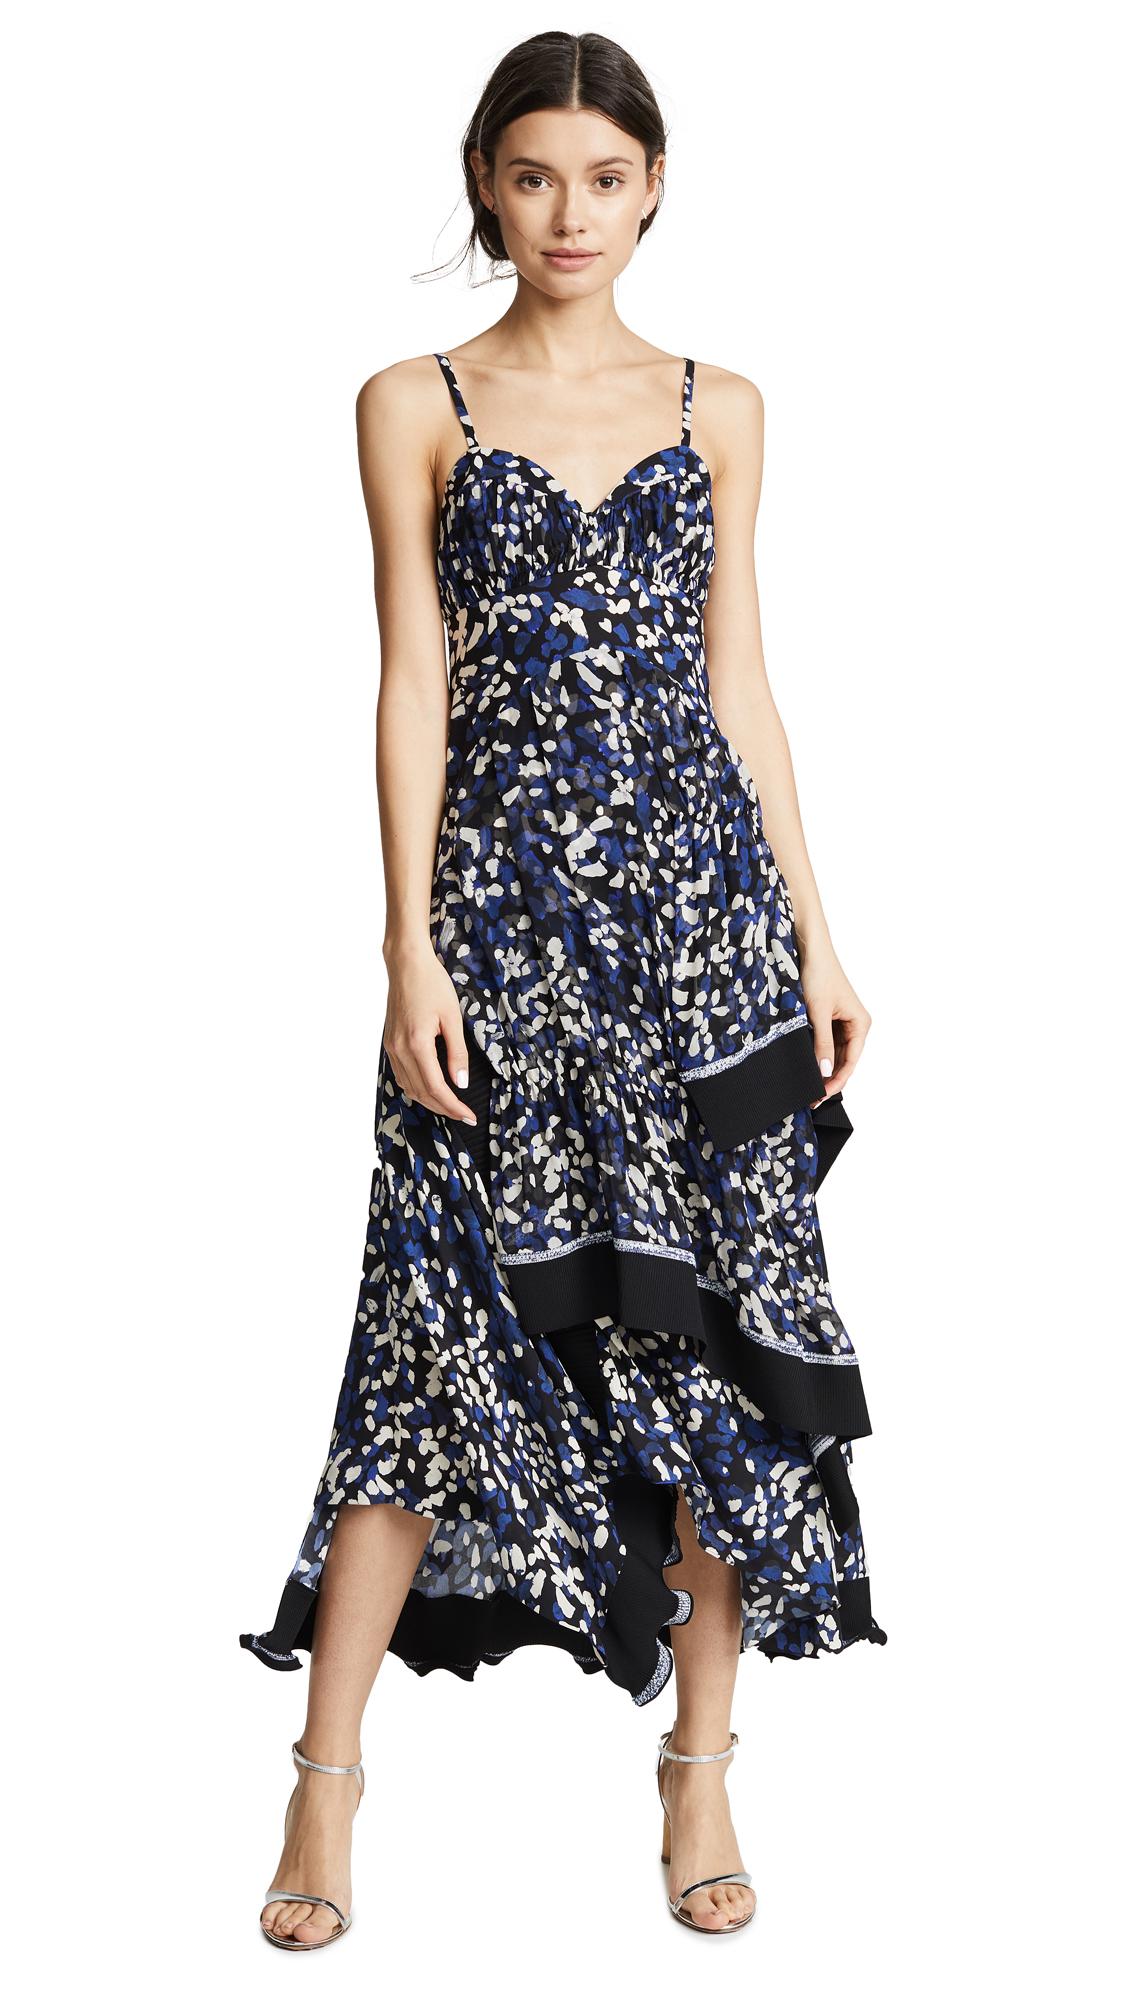 3.1 Phillip Lim Painted Dot Dress In Black/Blue